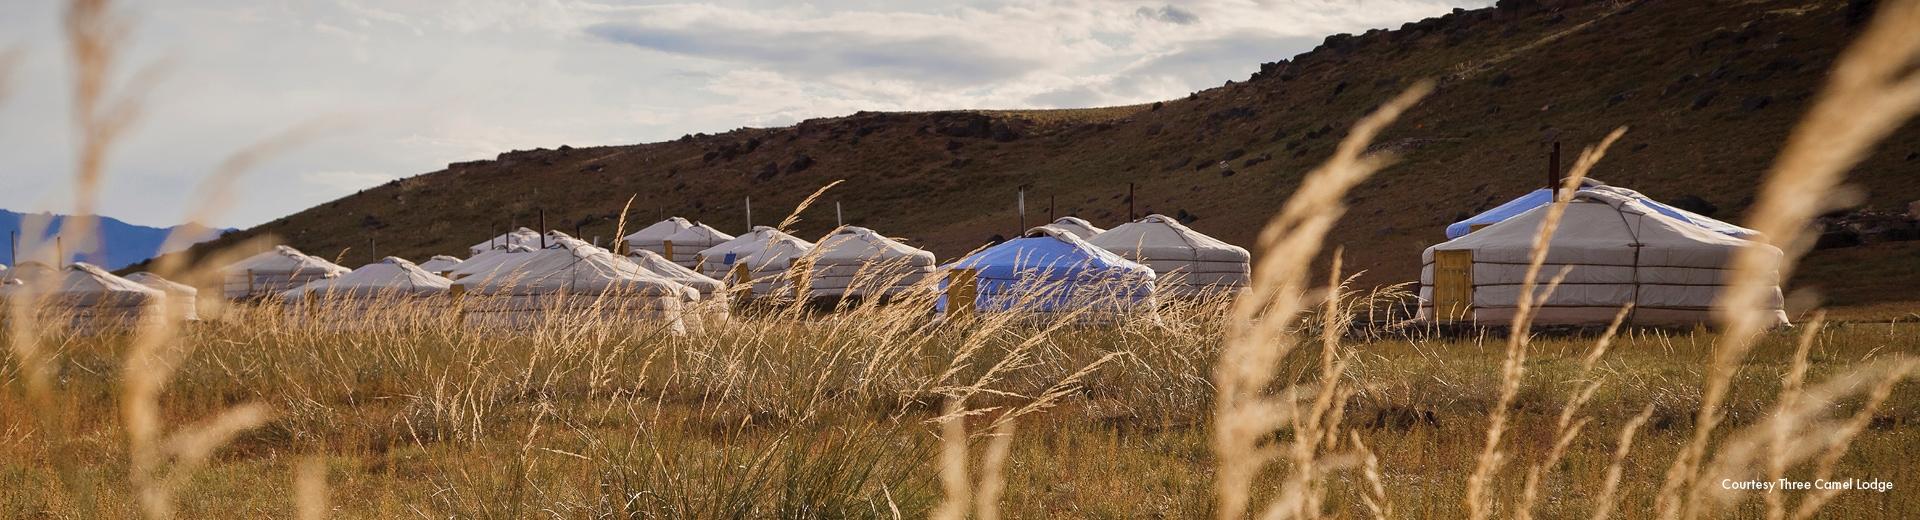 wild mongolia insider journey